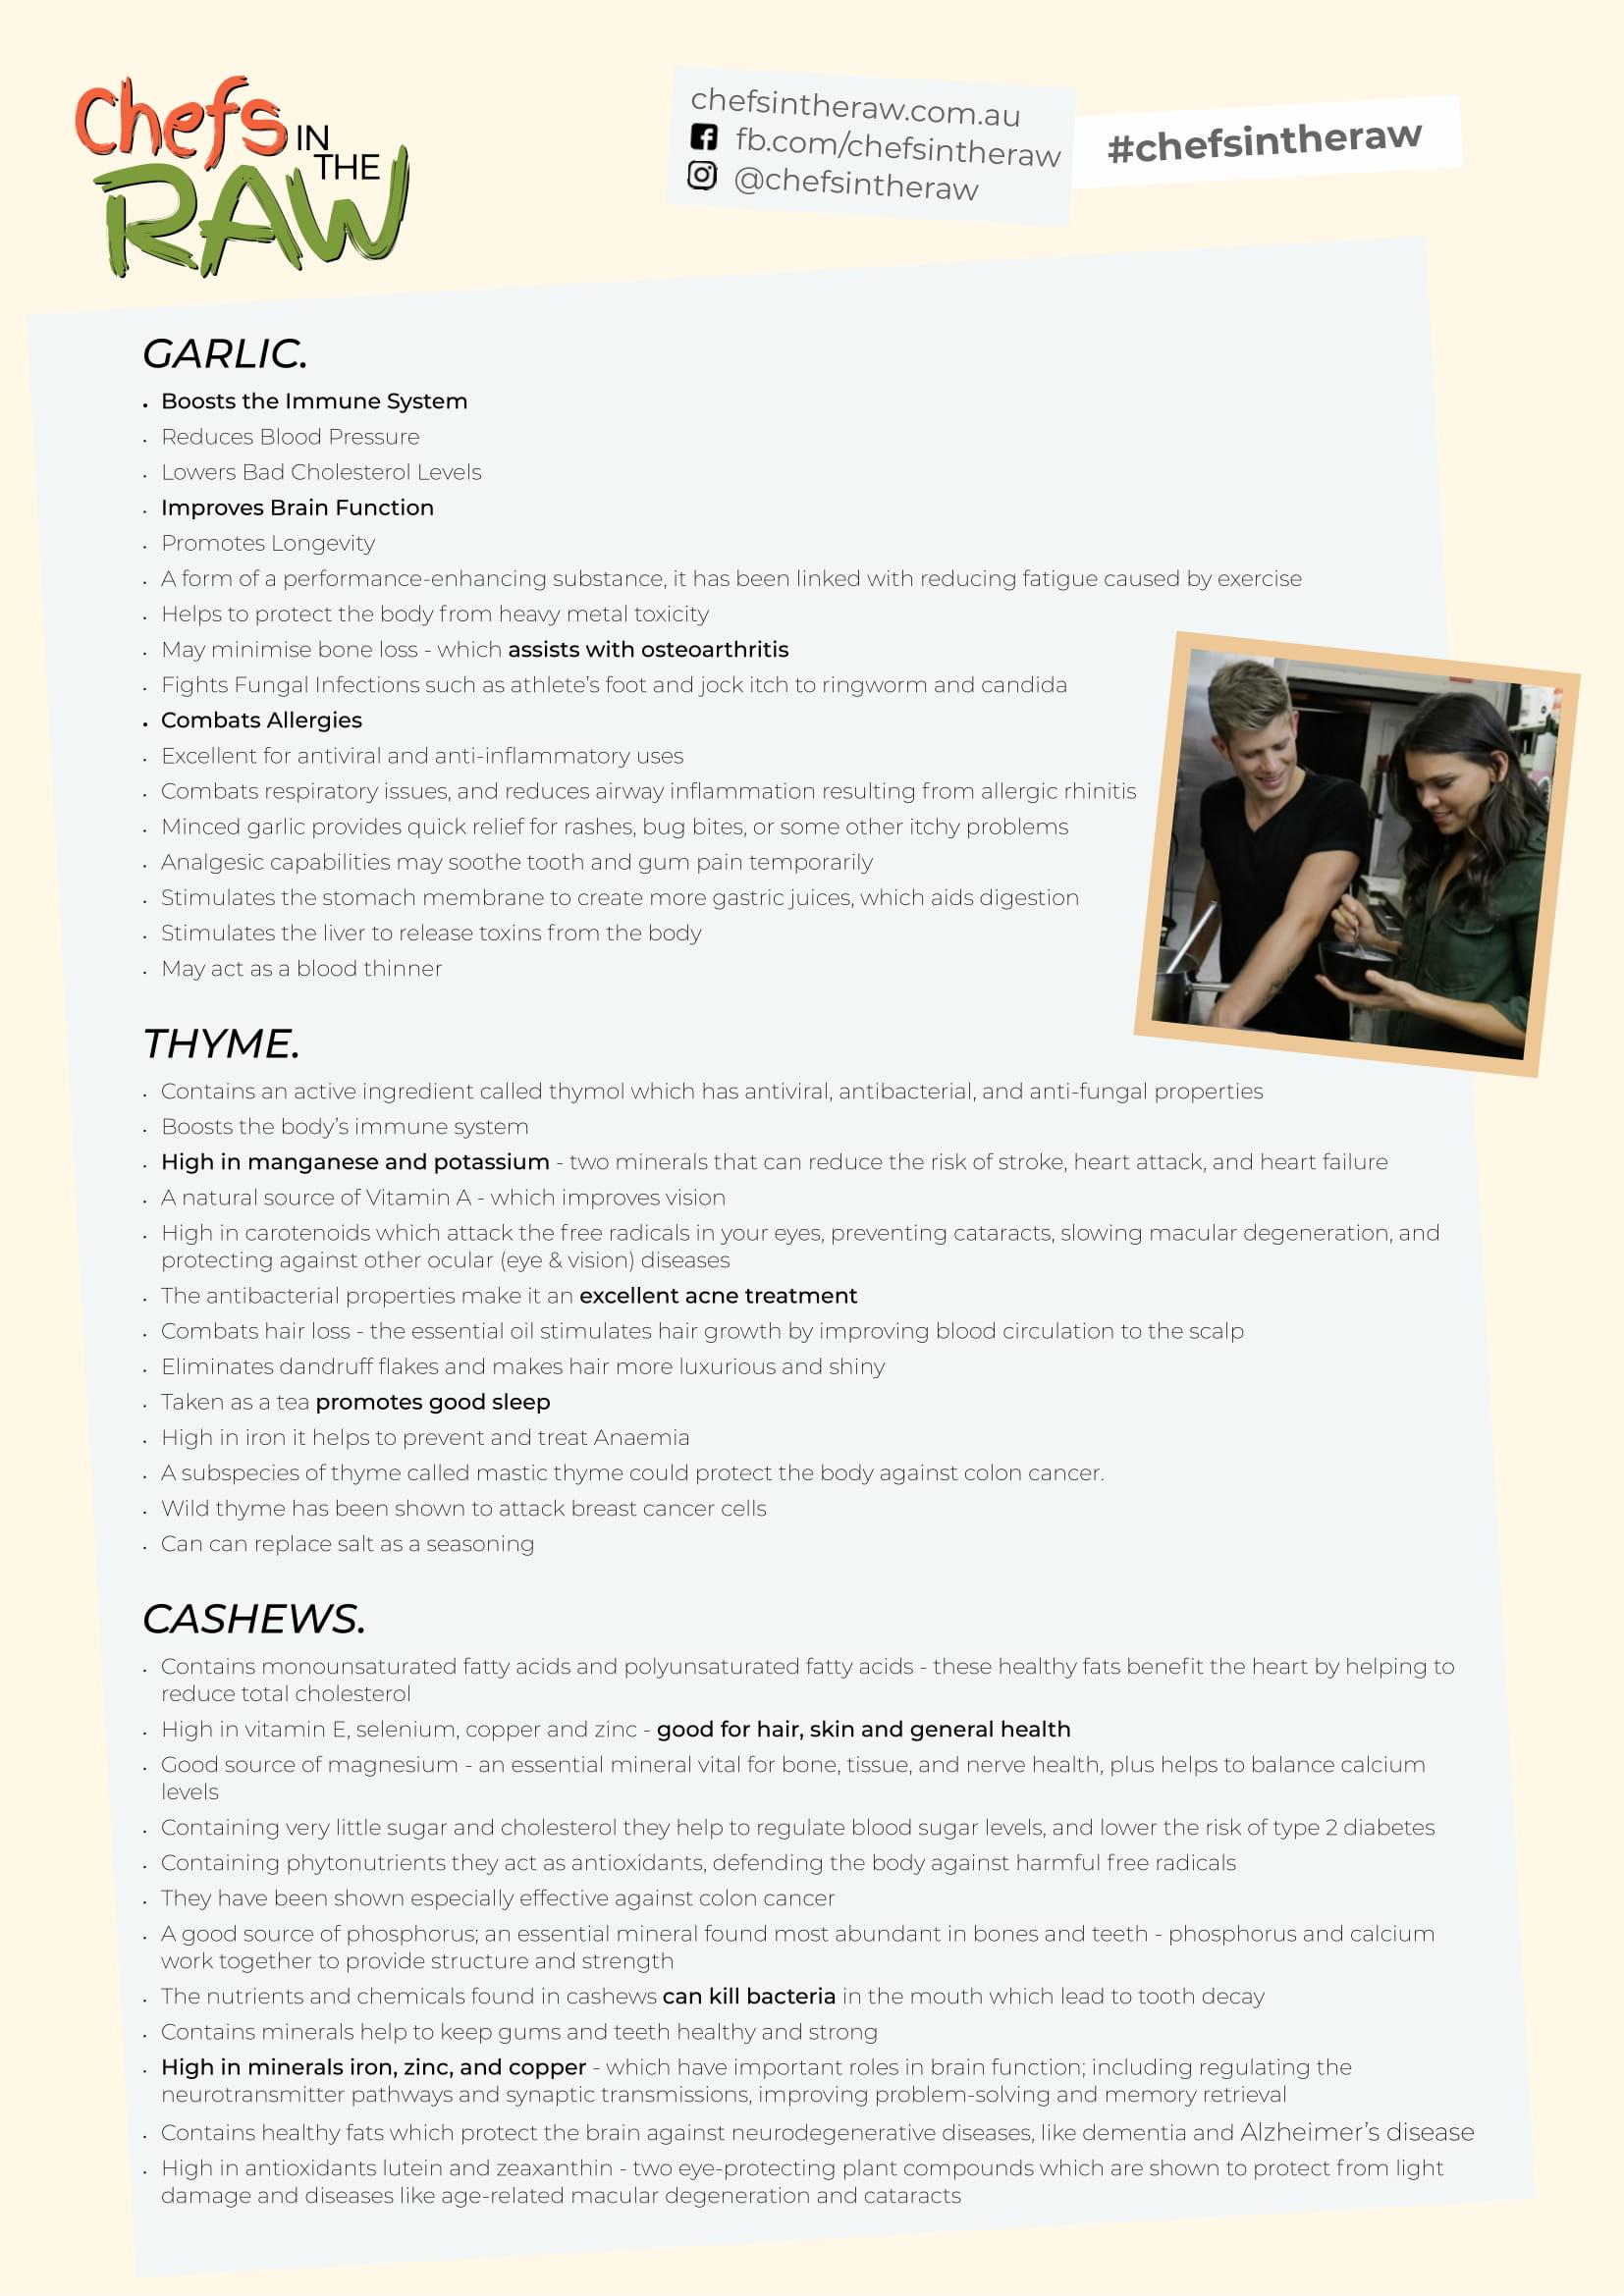 nutrition_creamymushroomsoup-2.jpg